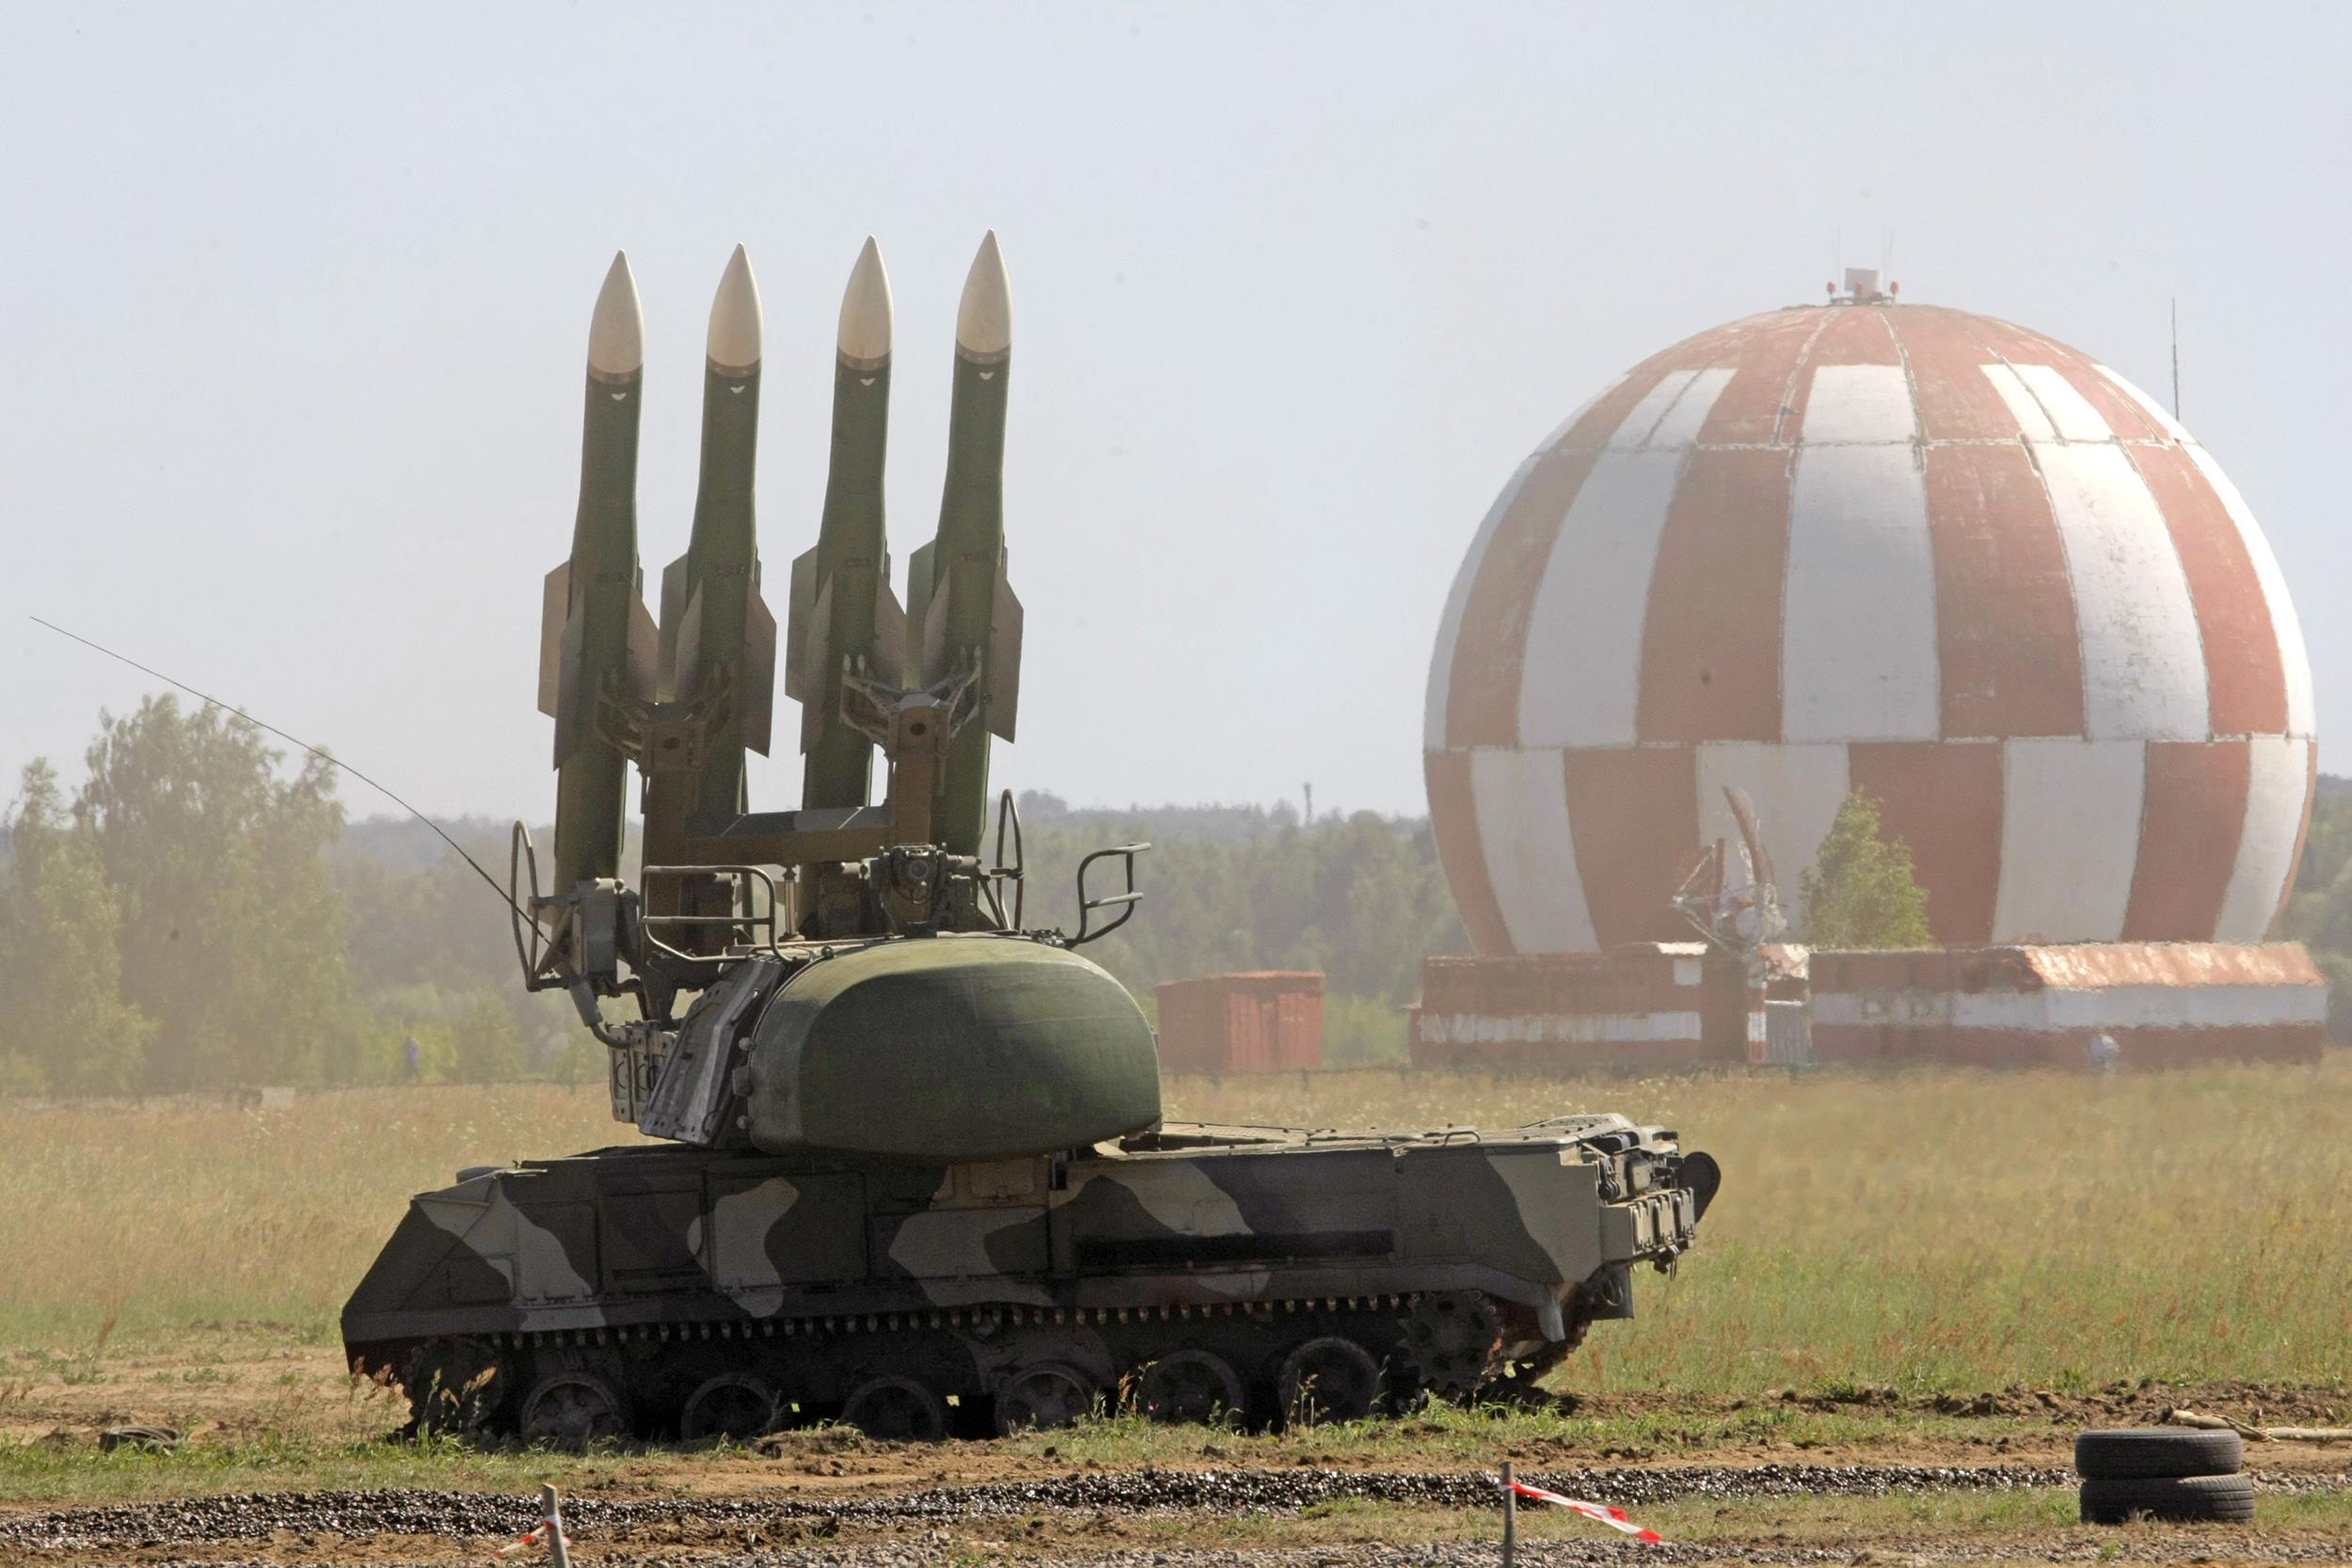 Image: A Russian Buk-M2 air defense system